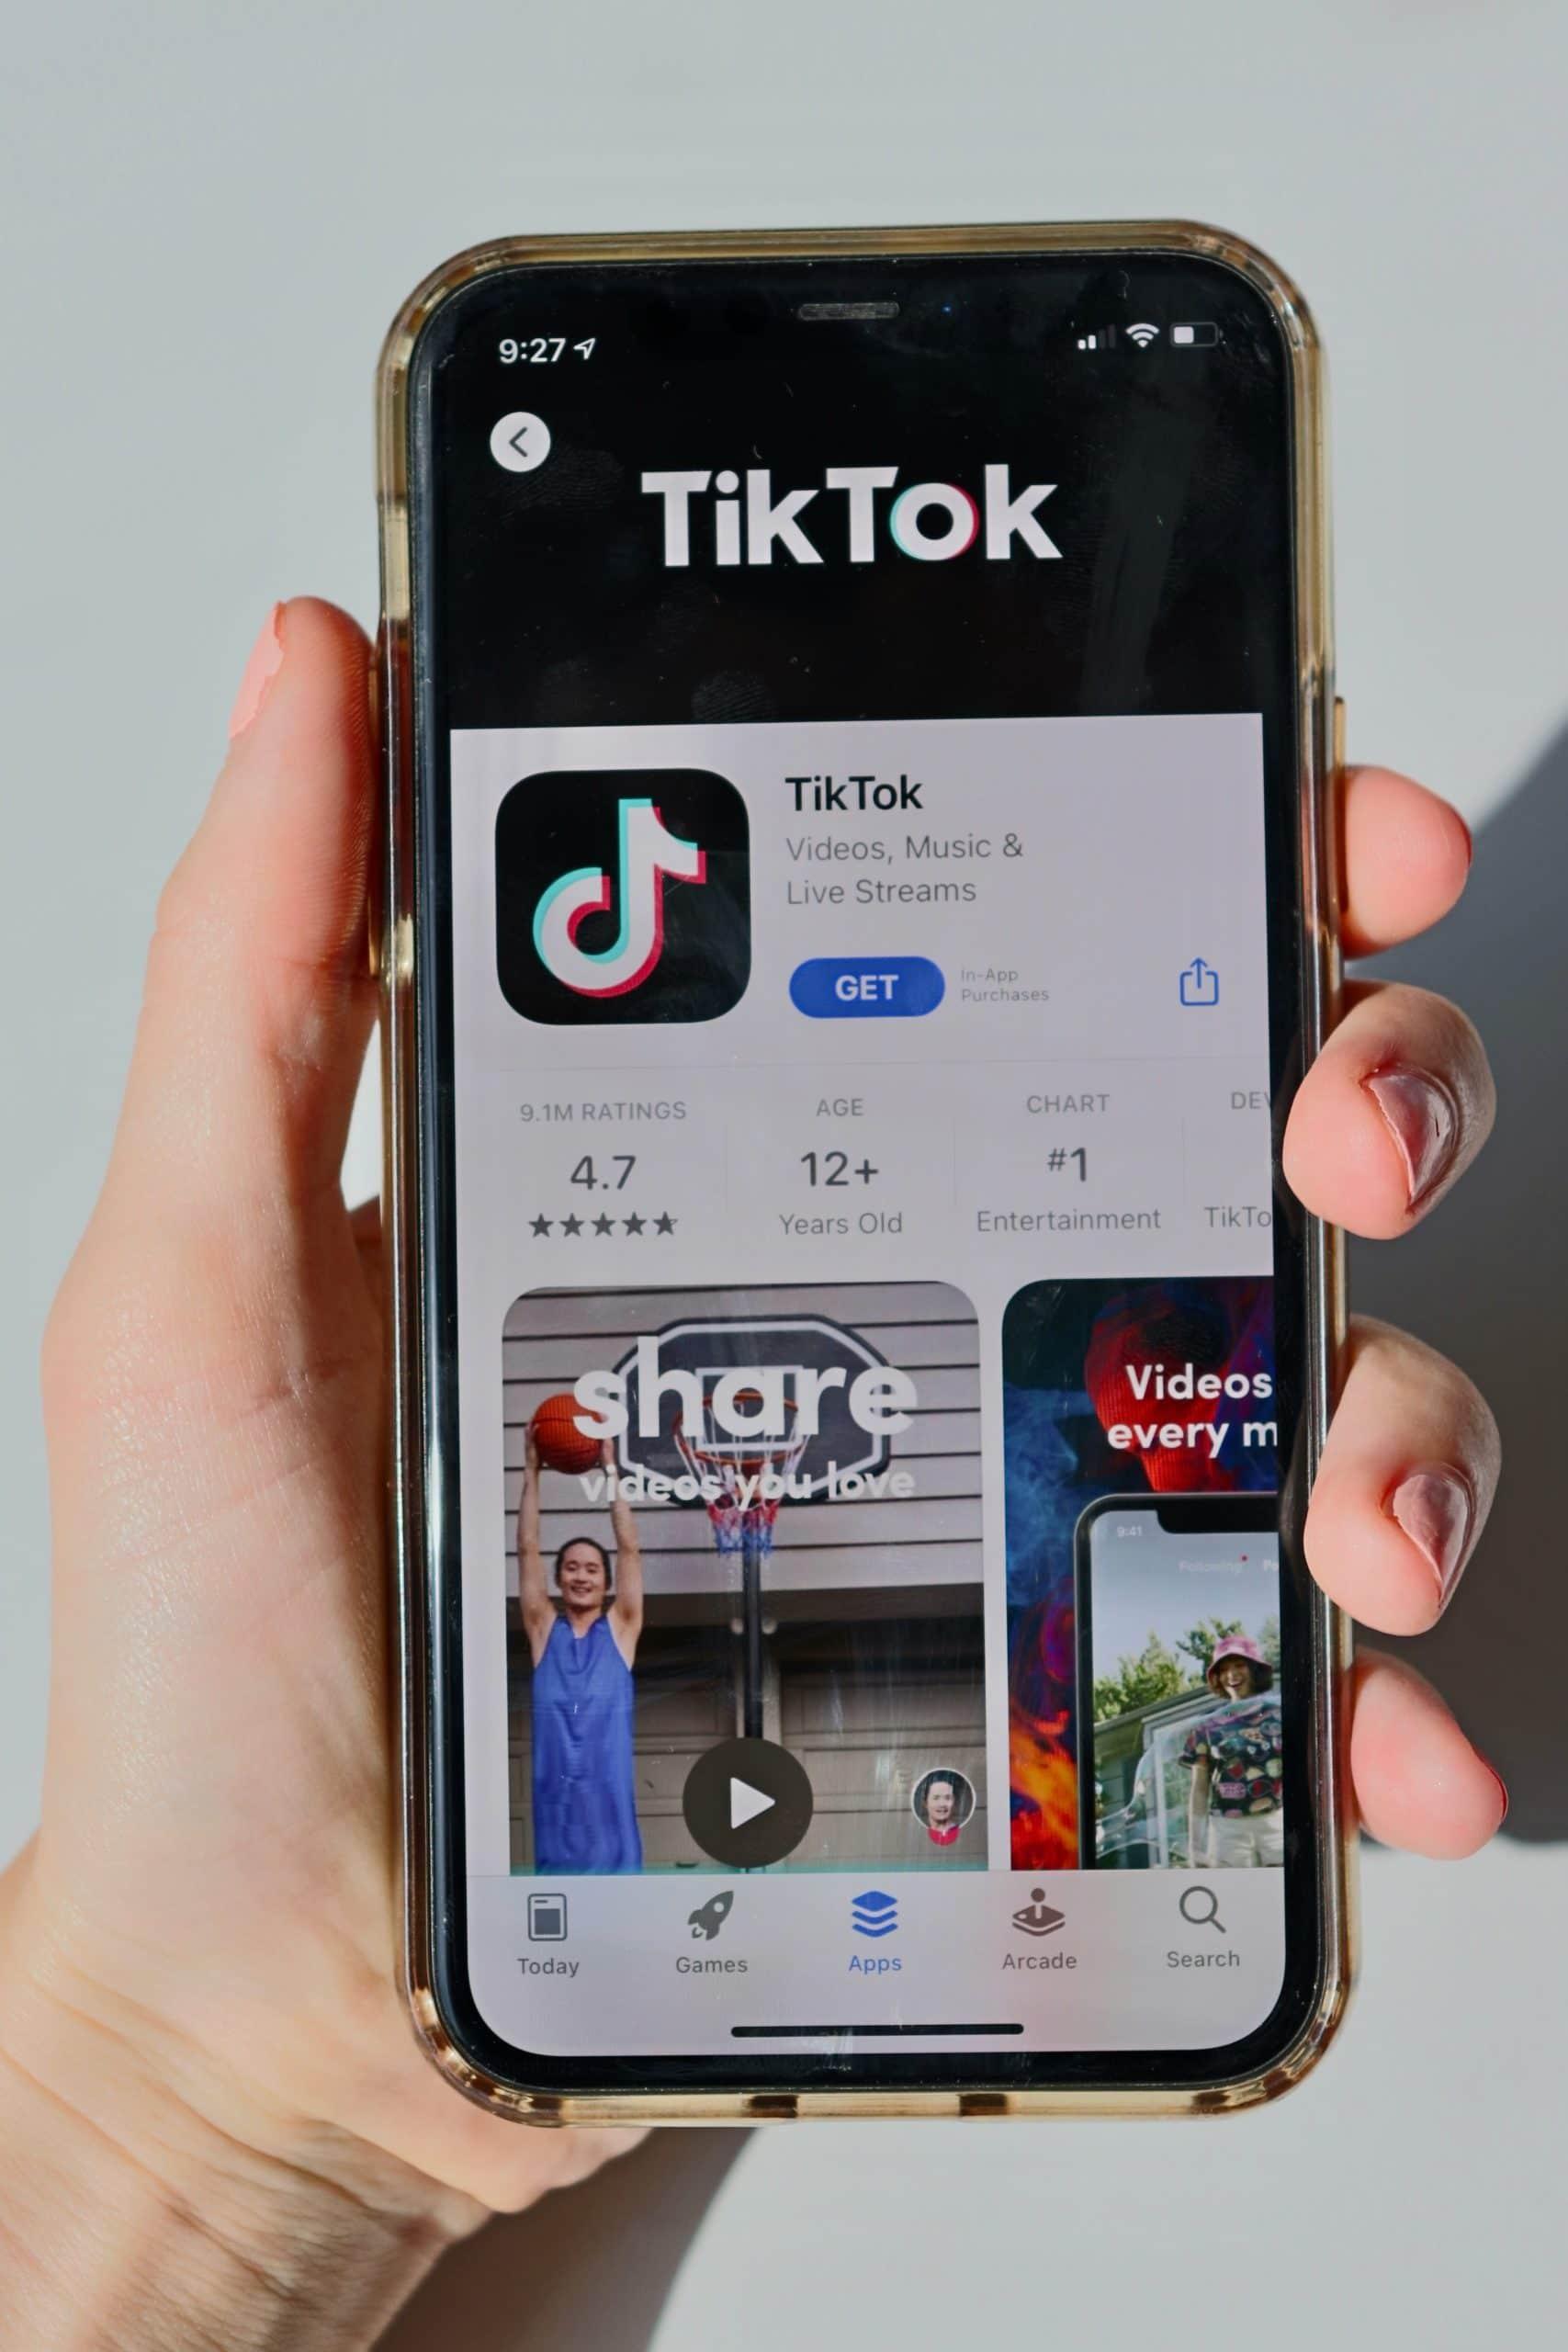 B2C Marketing on TikTok for Forward-Thinking Businesses